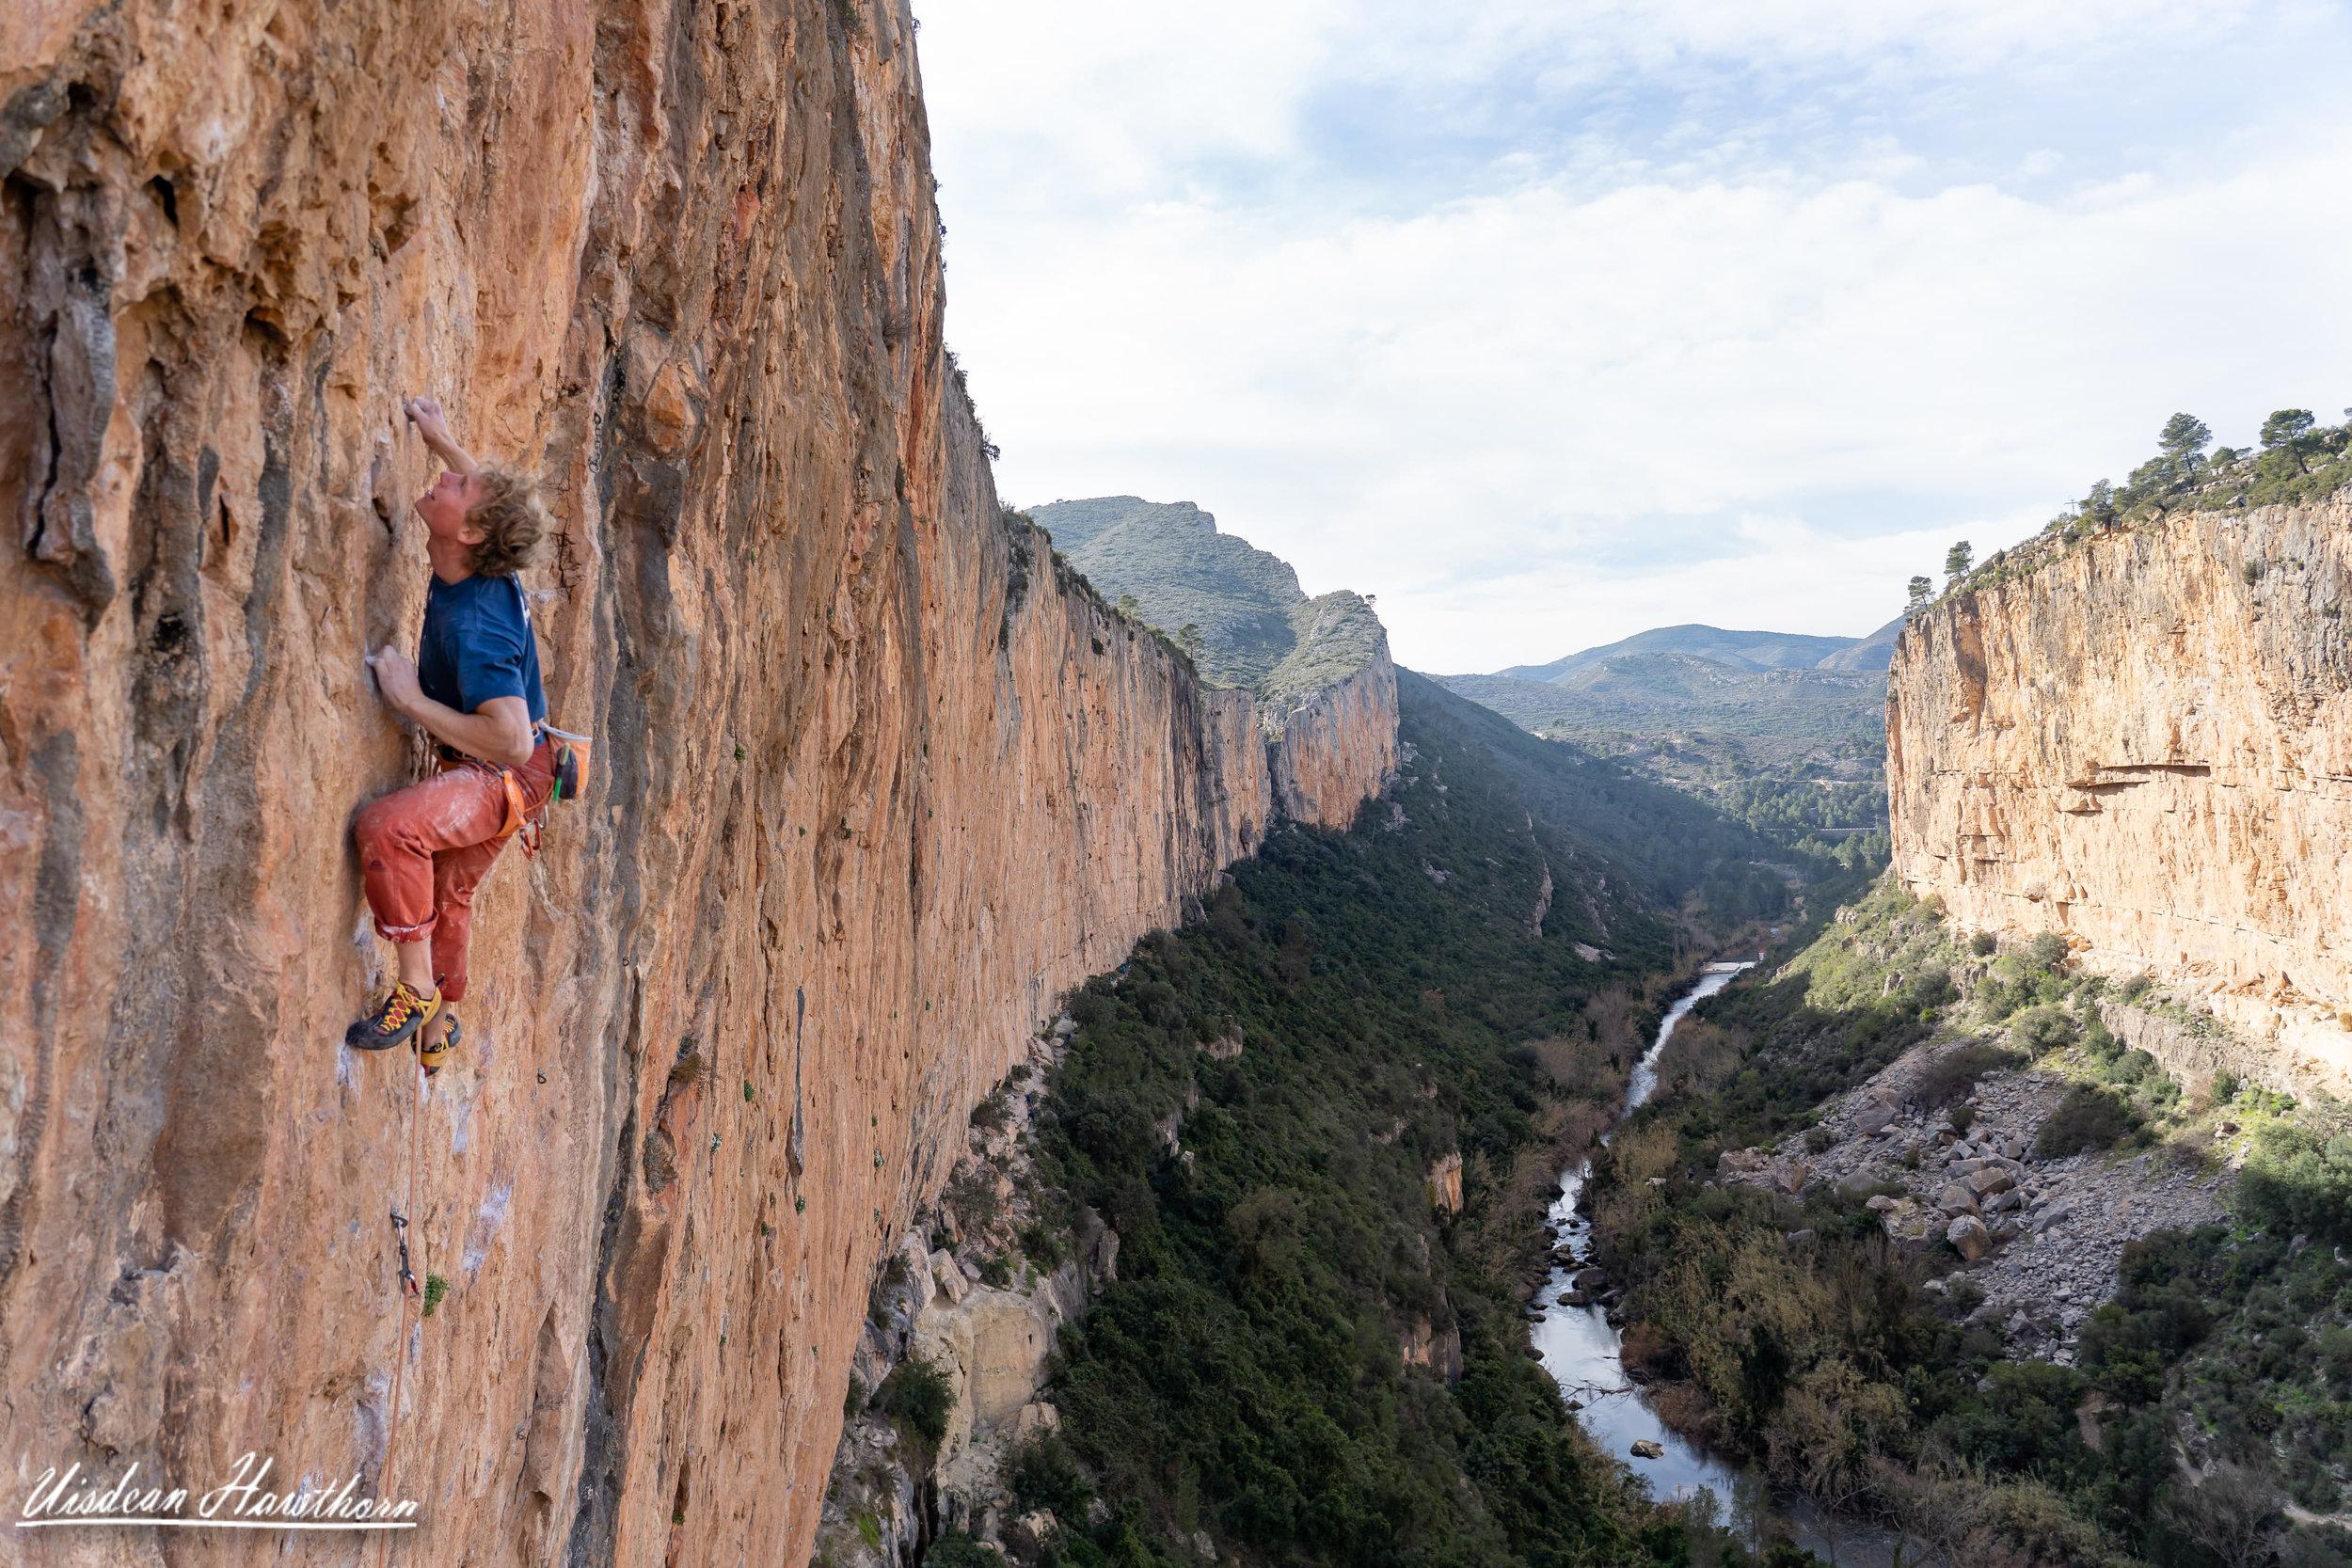 La Mala (8b), Chulilla, Spain. Photo: Uisdean Hawthorn